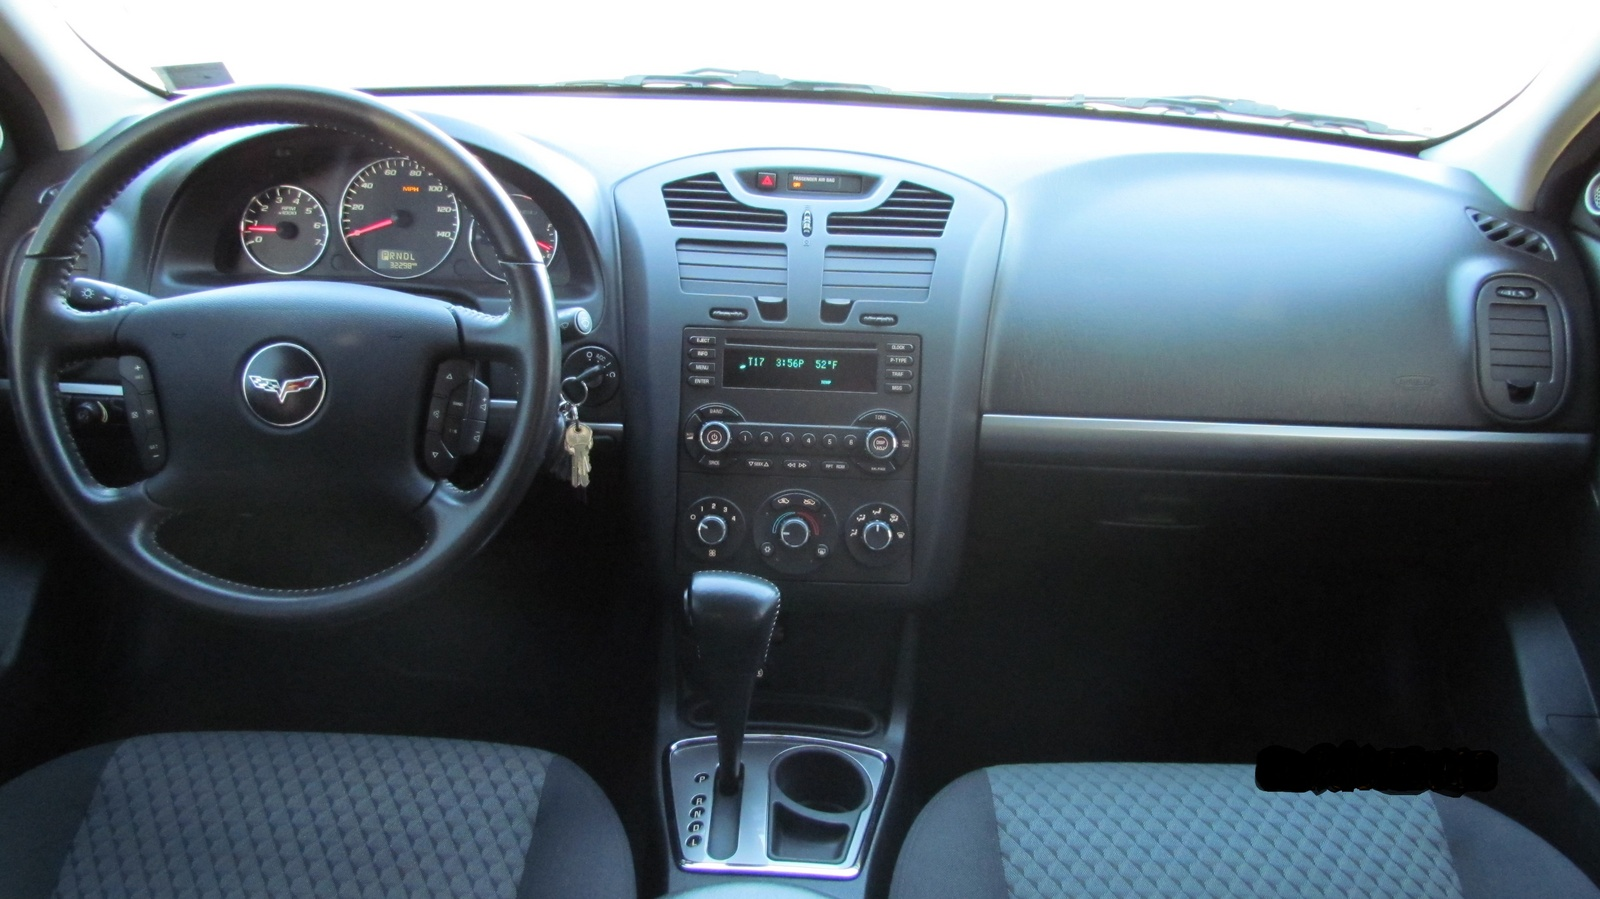 2007 Chevrolet Malibu LT - Pictures - Picture of 2007 Chevrolet Mali ...